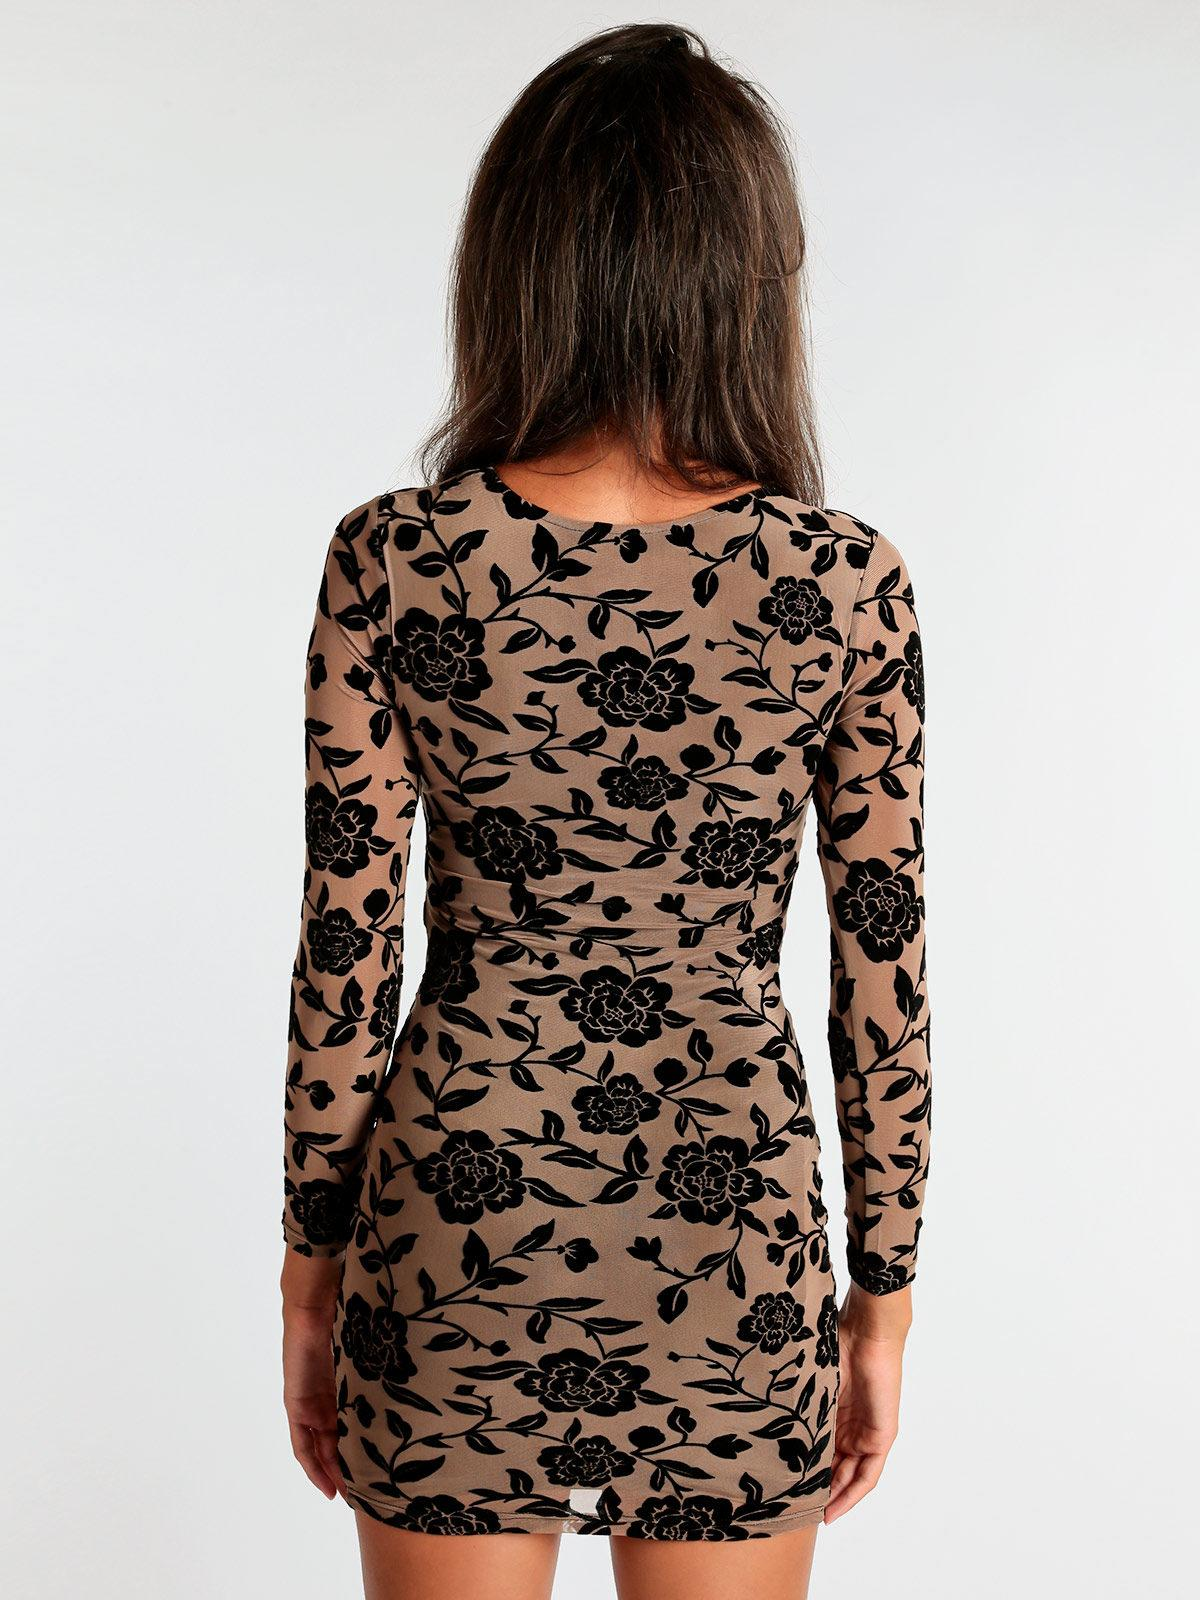 zeza fashion Abbigliamento donna   MecShopping